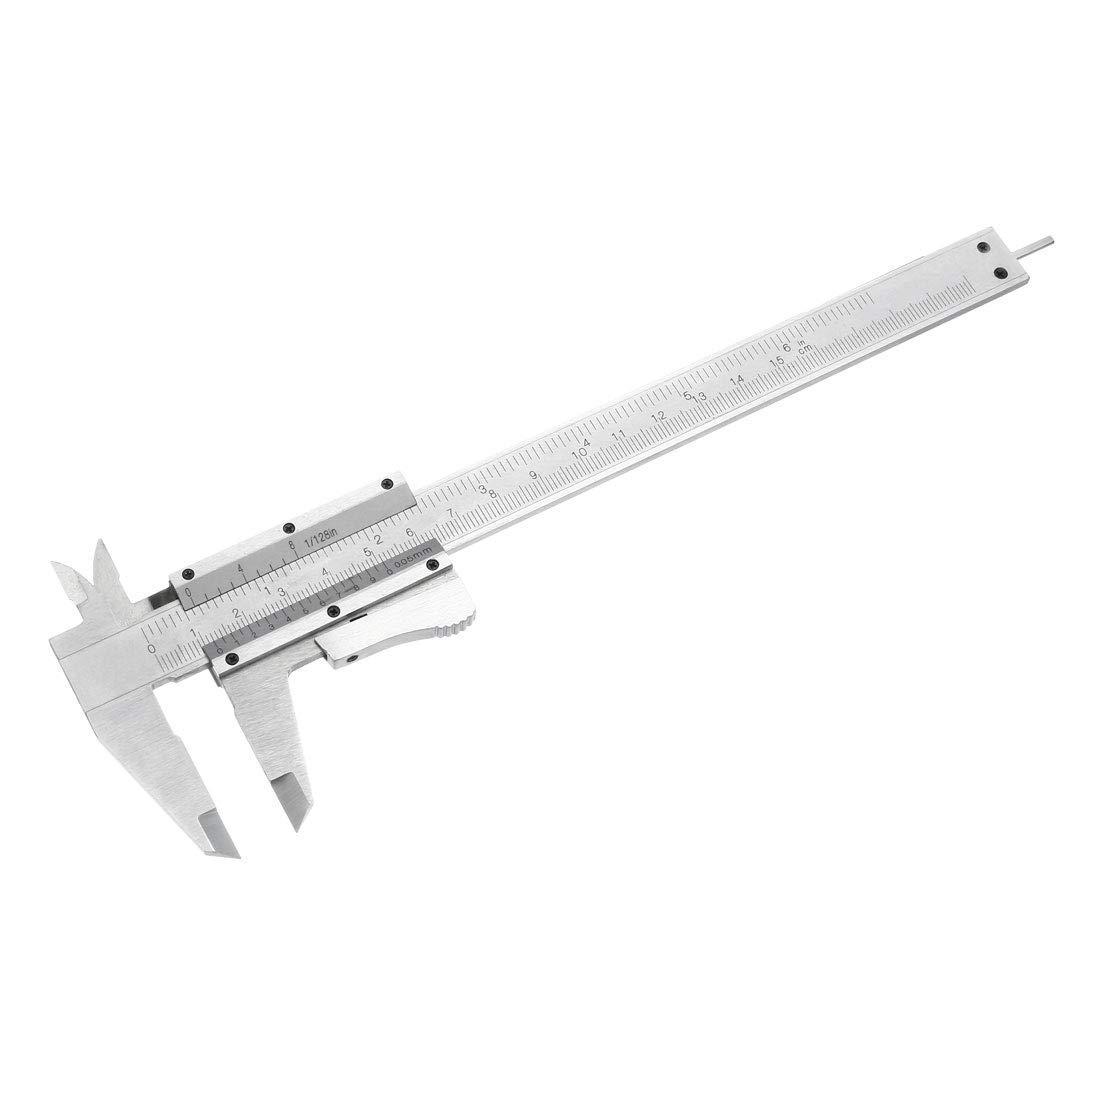 Vernier Caliper 6 Inch 150mmX 0.05mm Carbon Steel Gauge Measuring Tool for Precision Measurements Outside Inside Depth